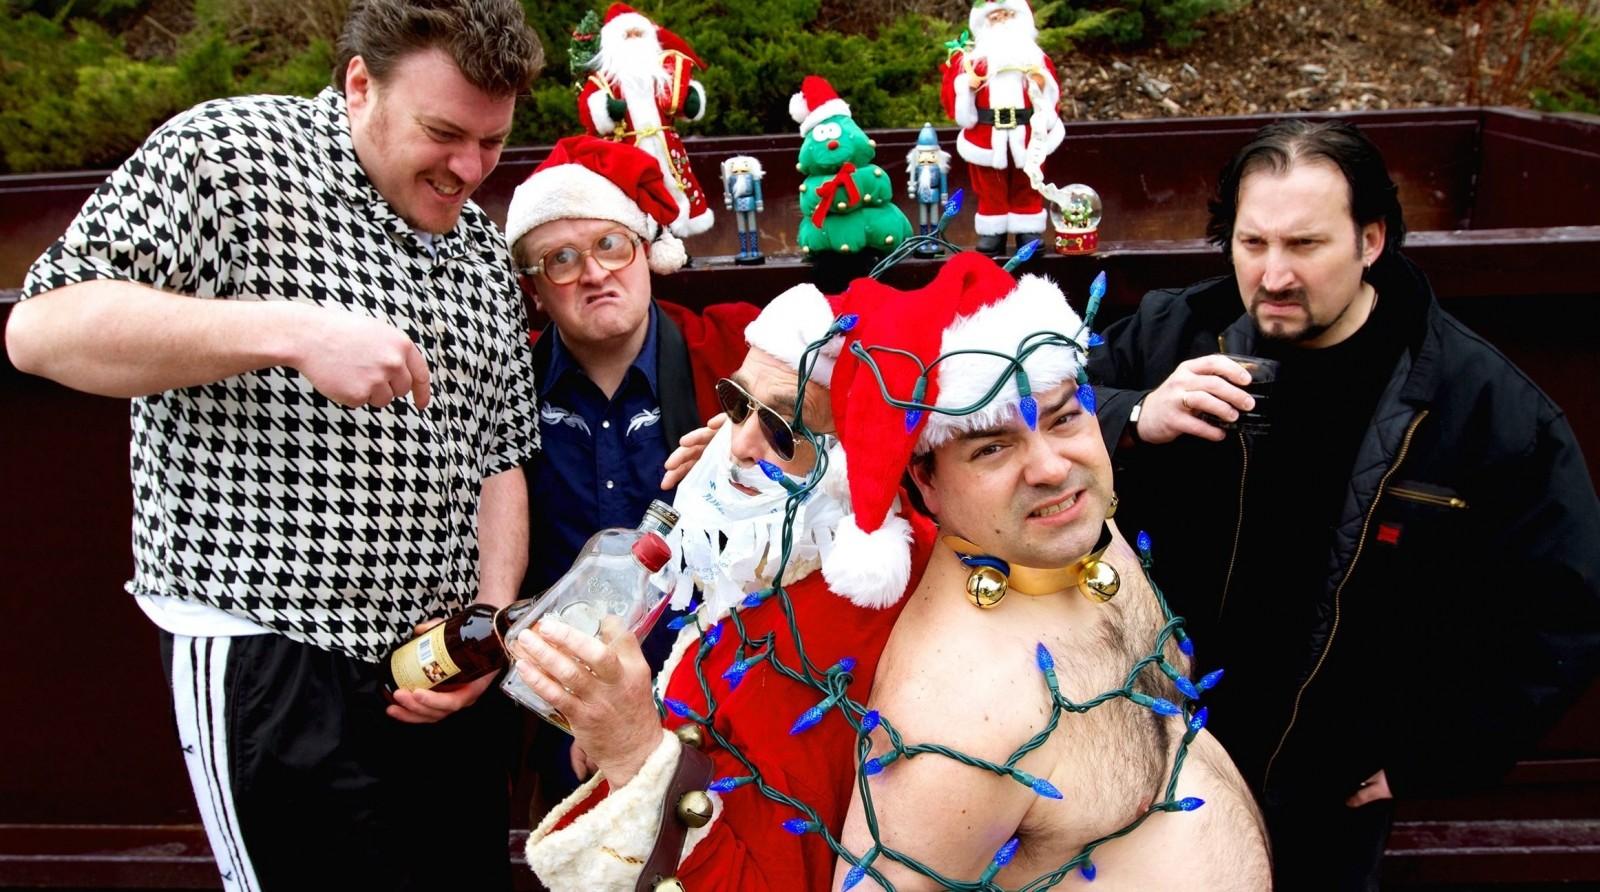 Trailer Park Boys, 'Dear Santa Claus 2015 Tour.'